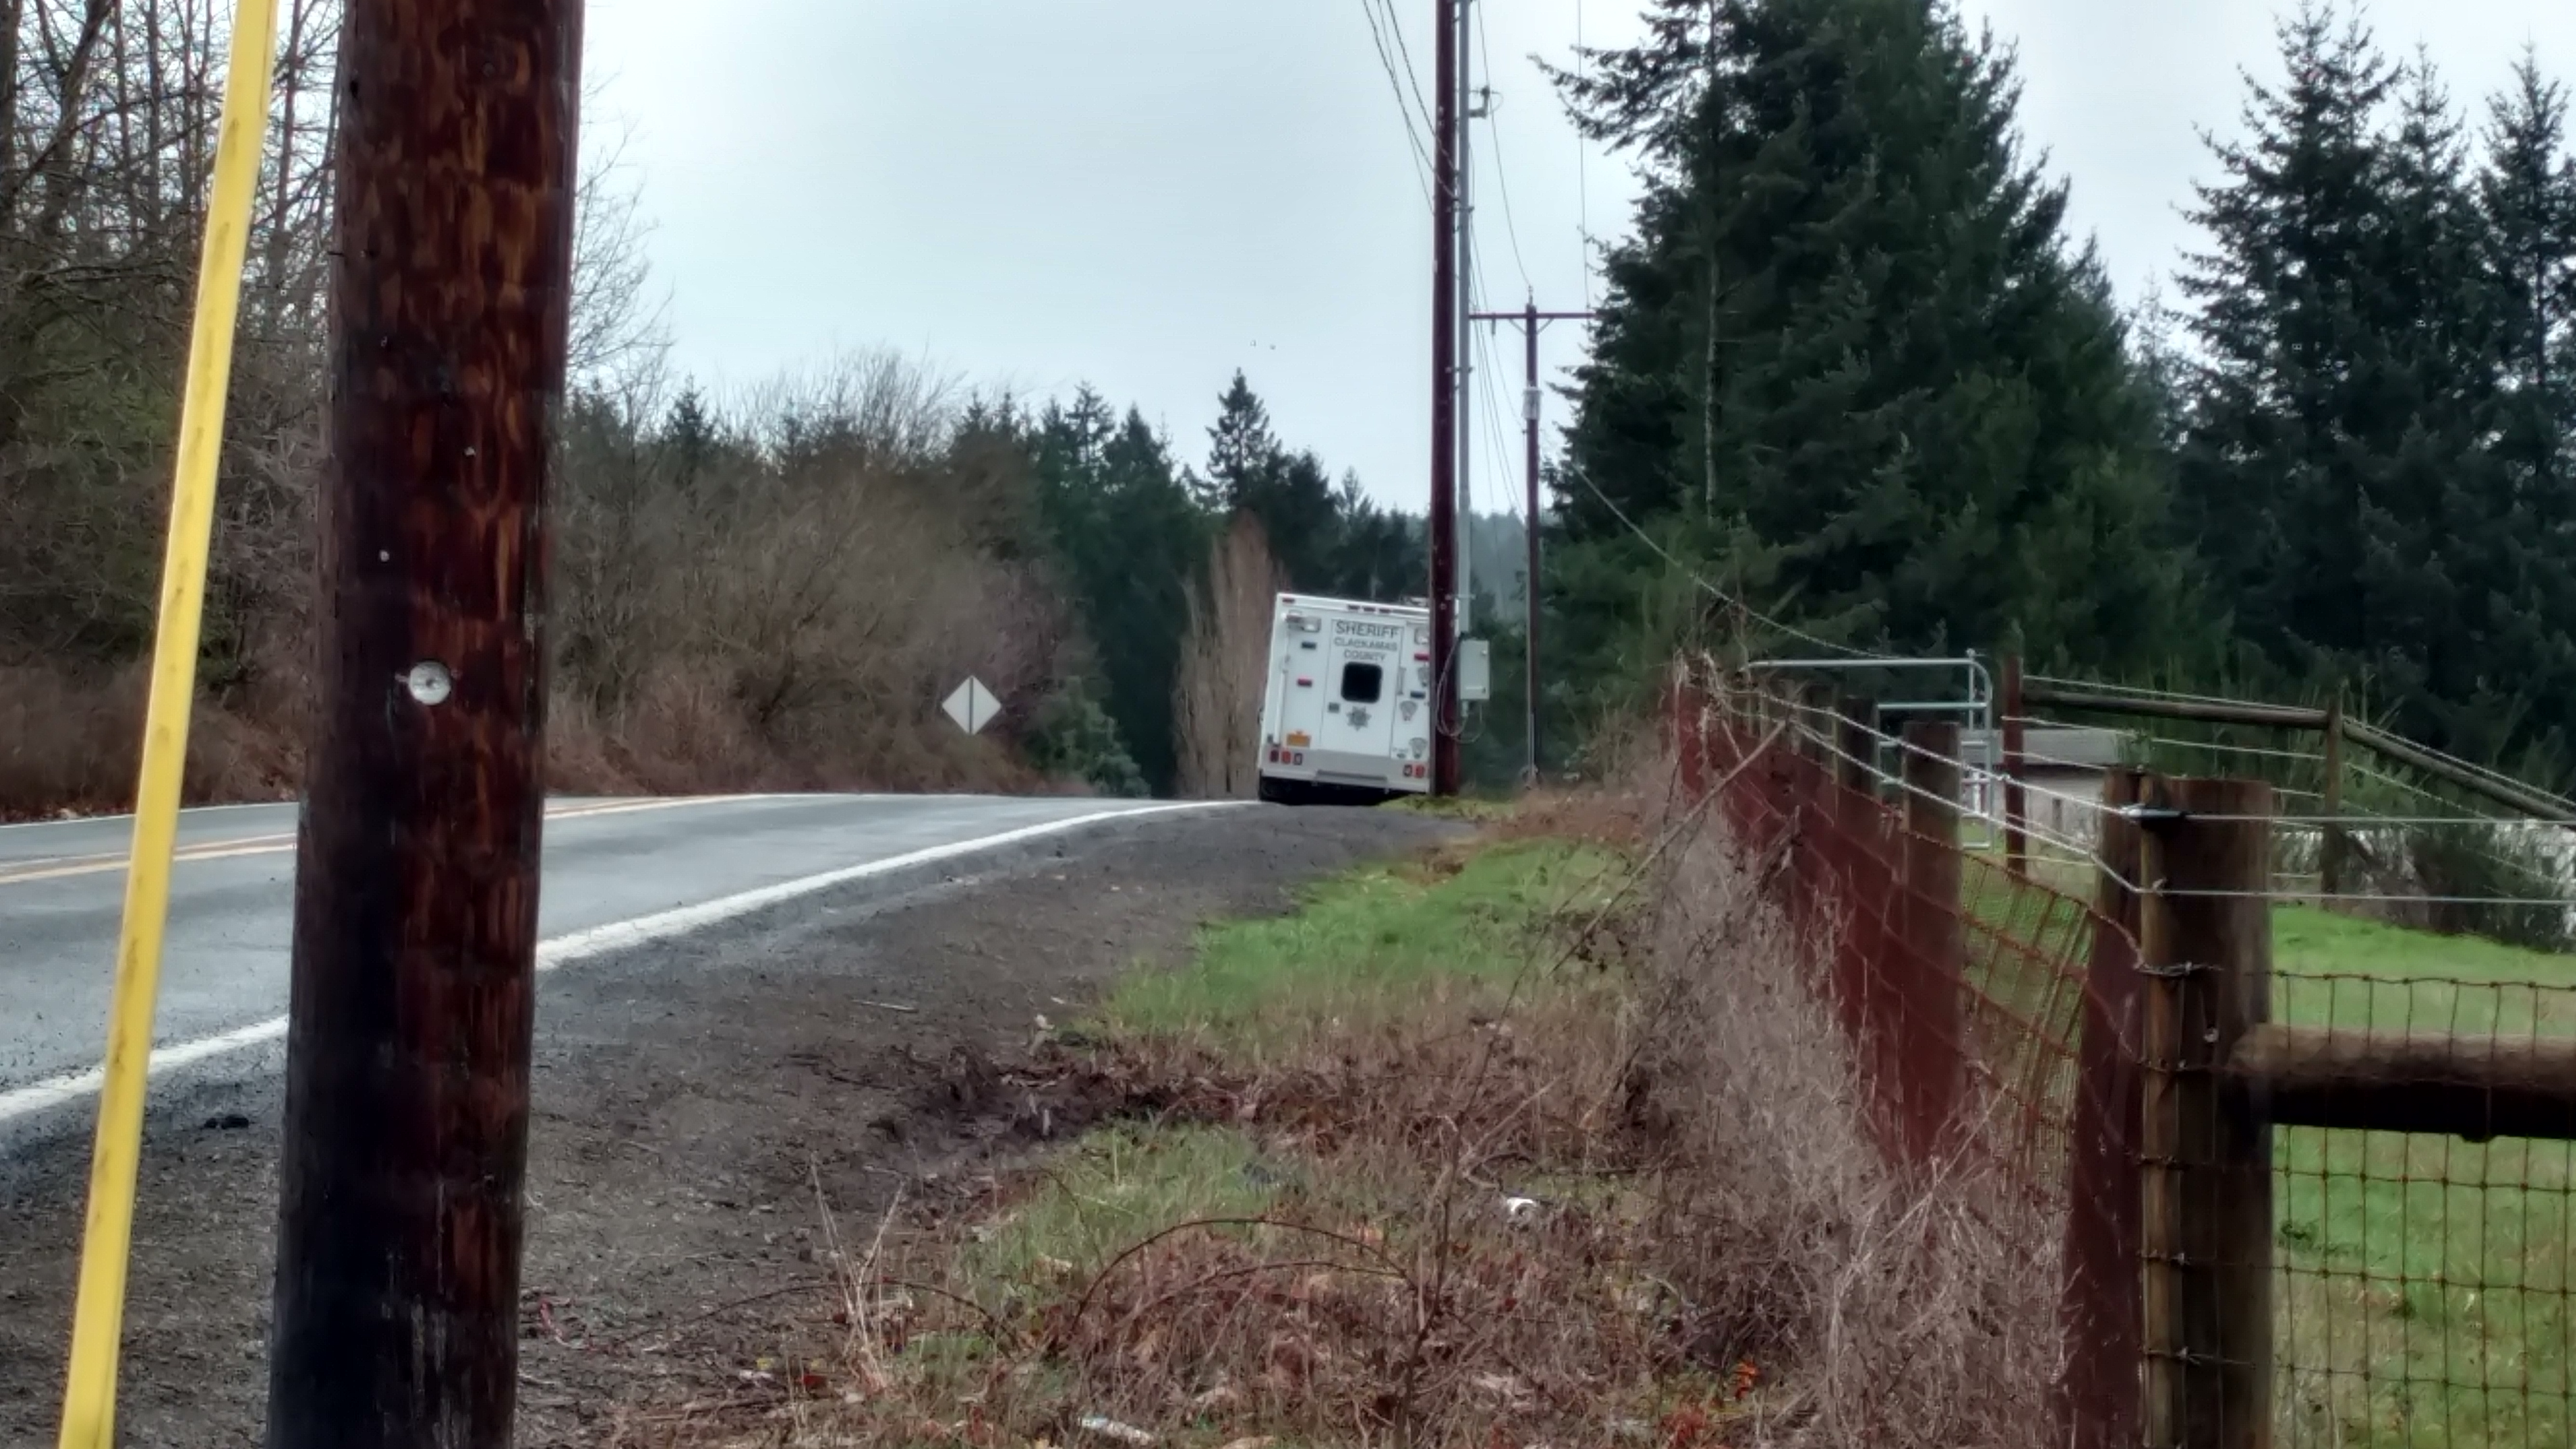 Suspect arrested in Beavercreek double homicide